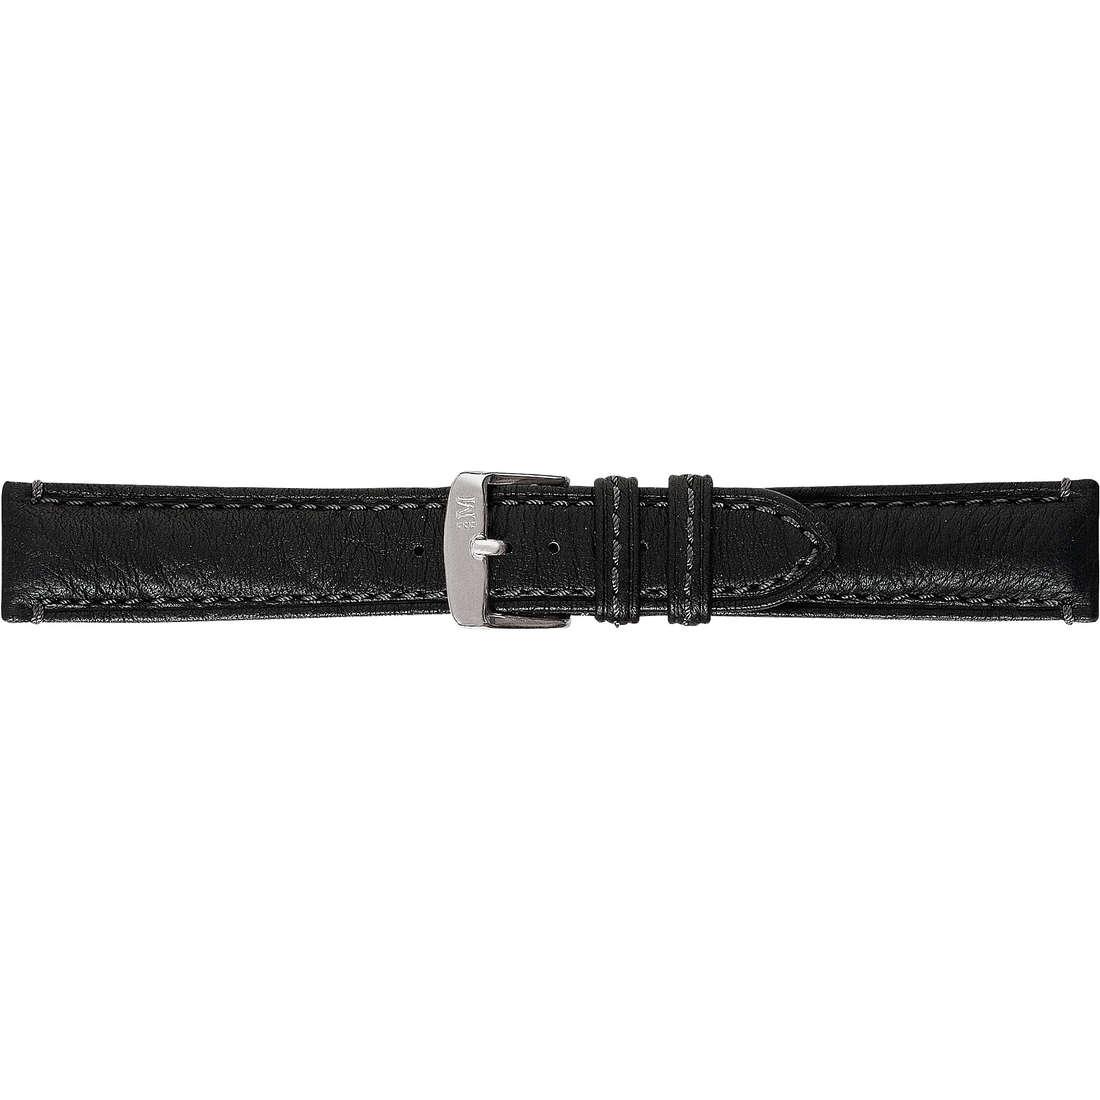 watch watch bands watch straps man Morellato Manufatti A01U3221767019CR22